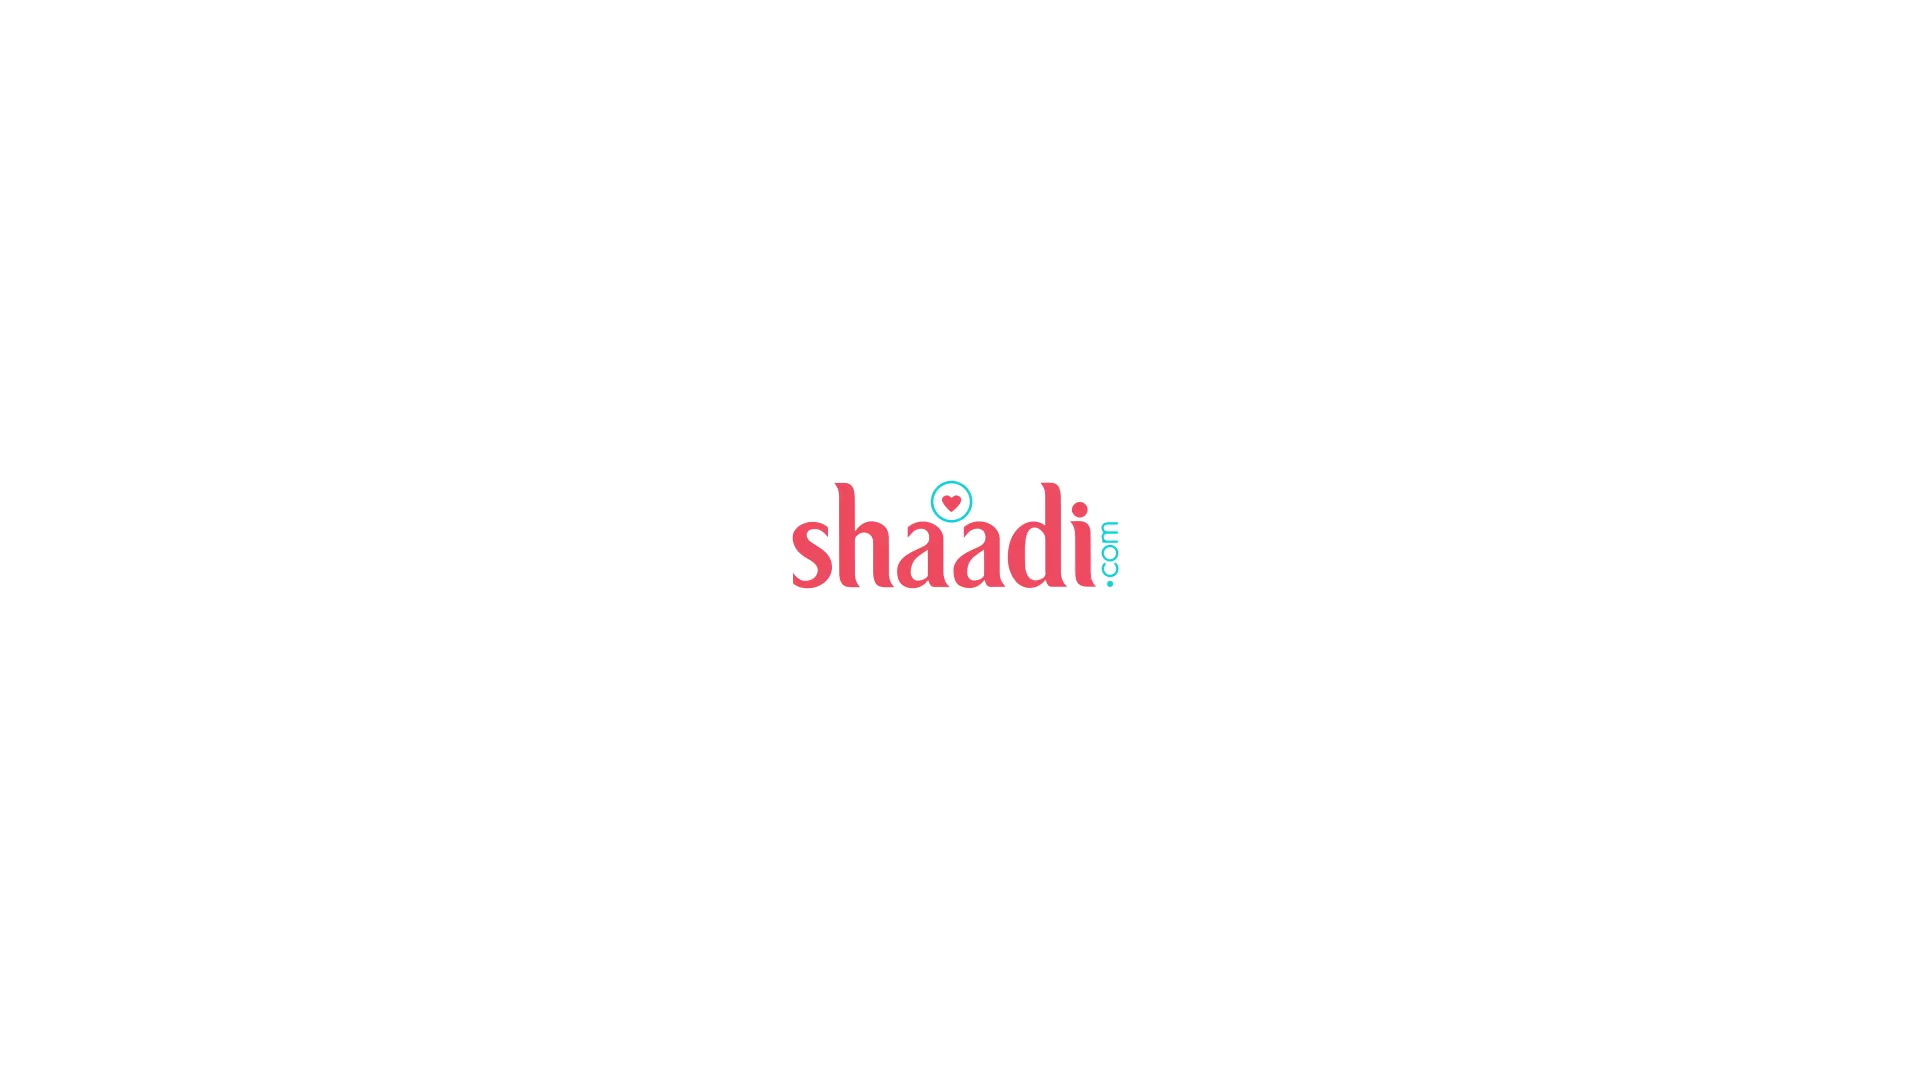 Shaadi Traffic Increases 40% During Indian Lockdown